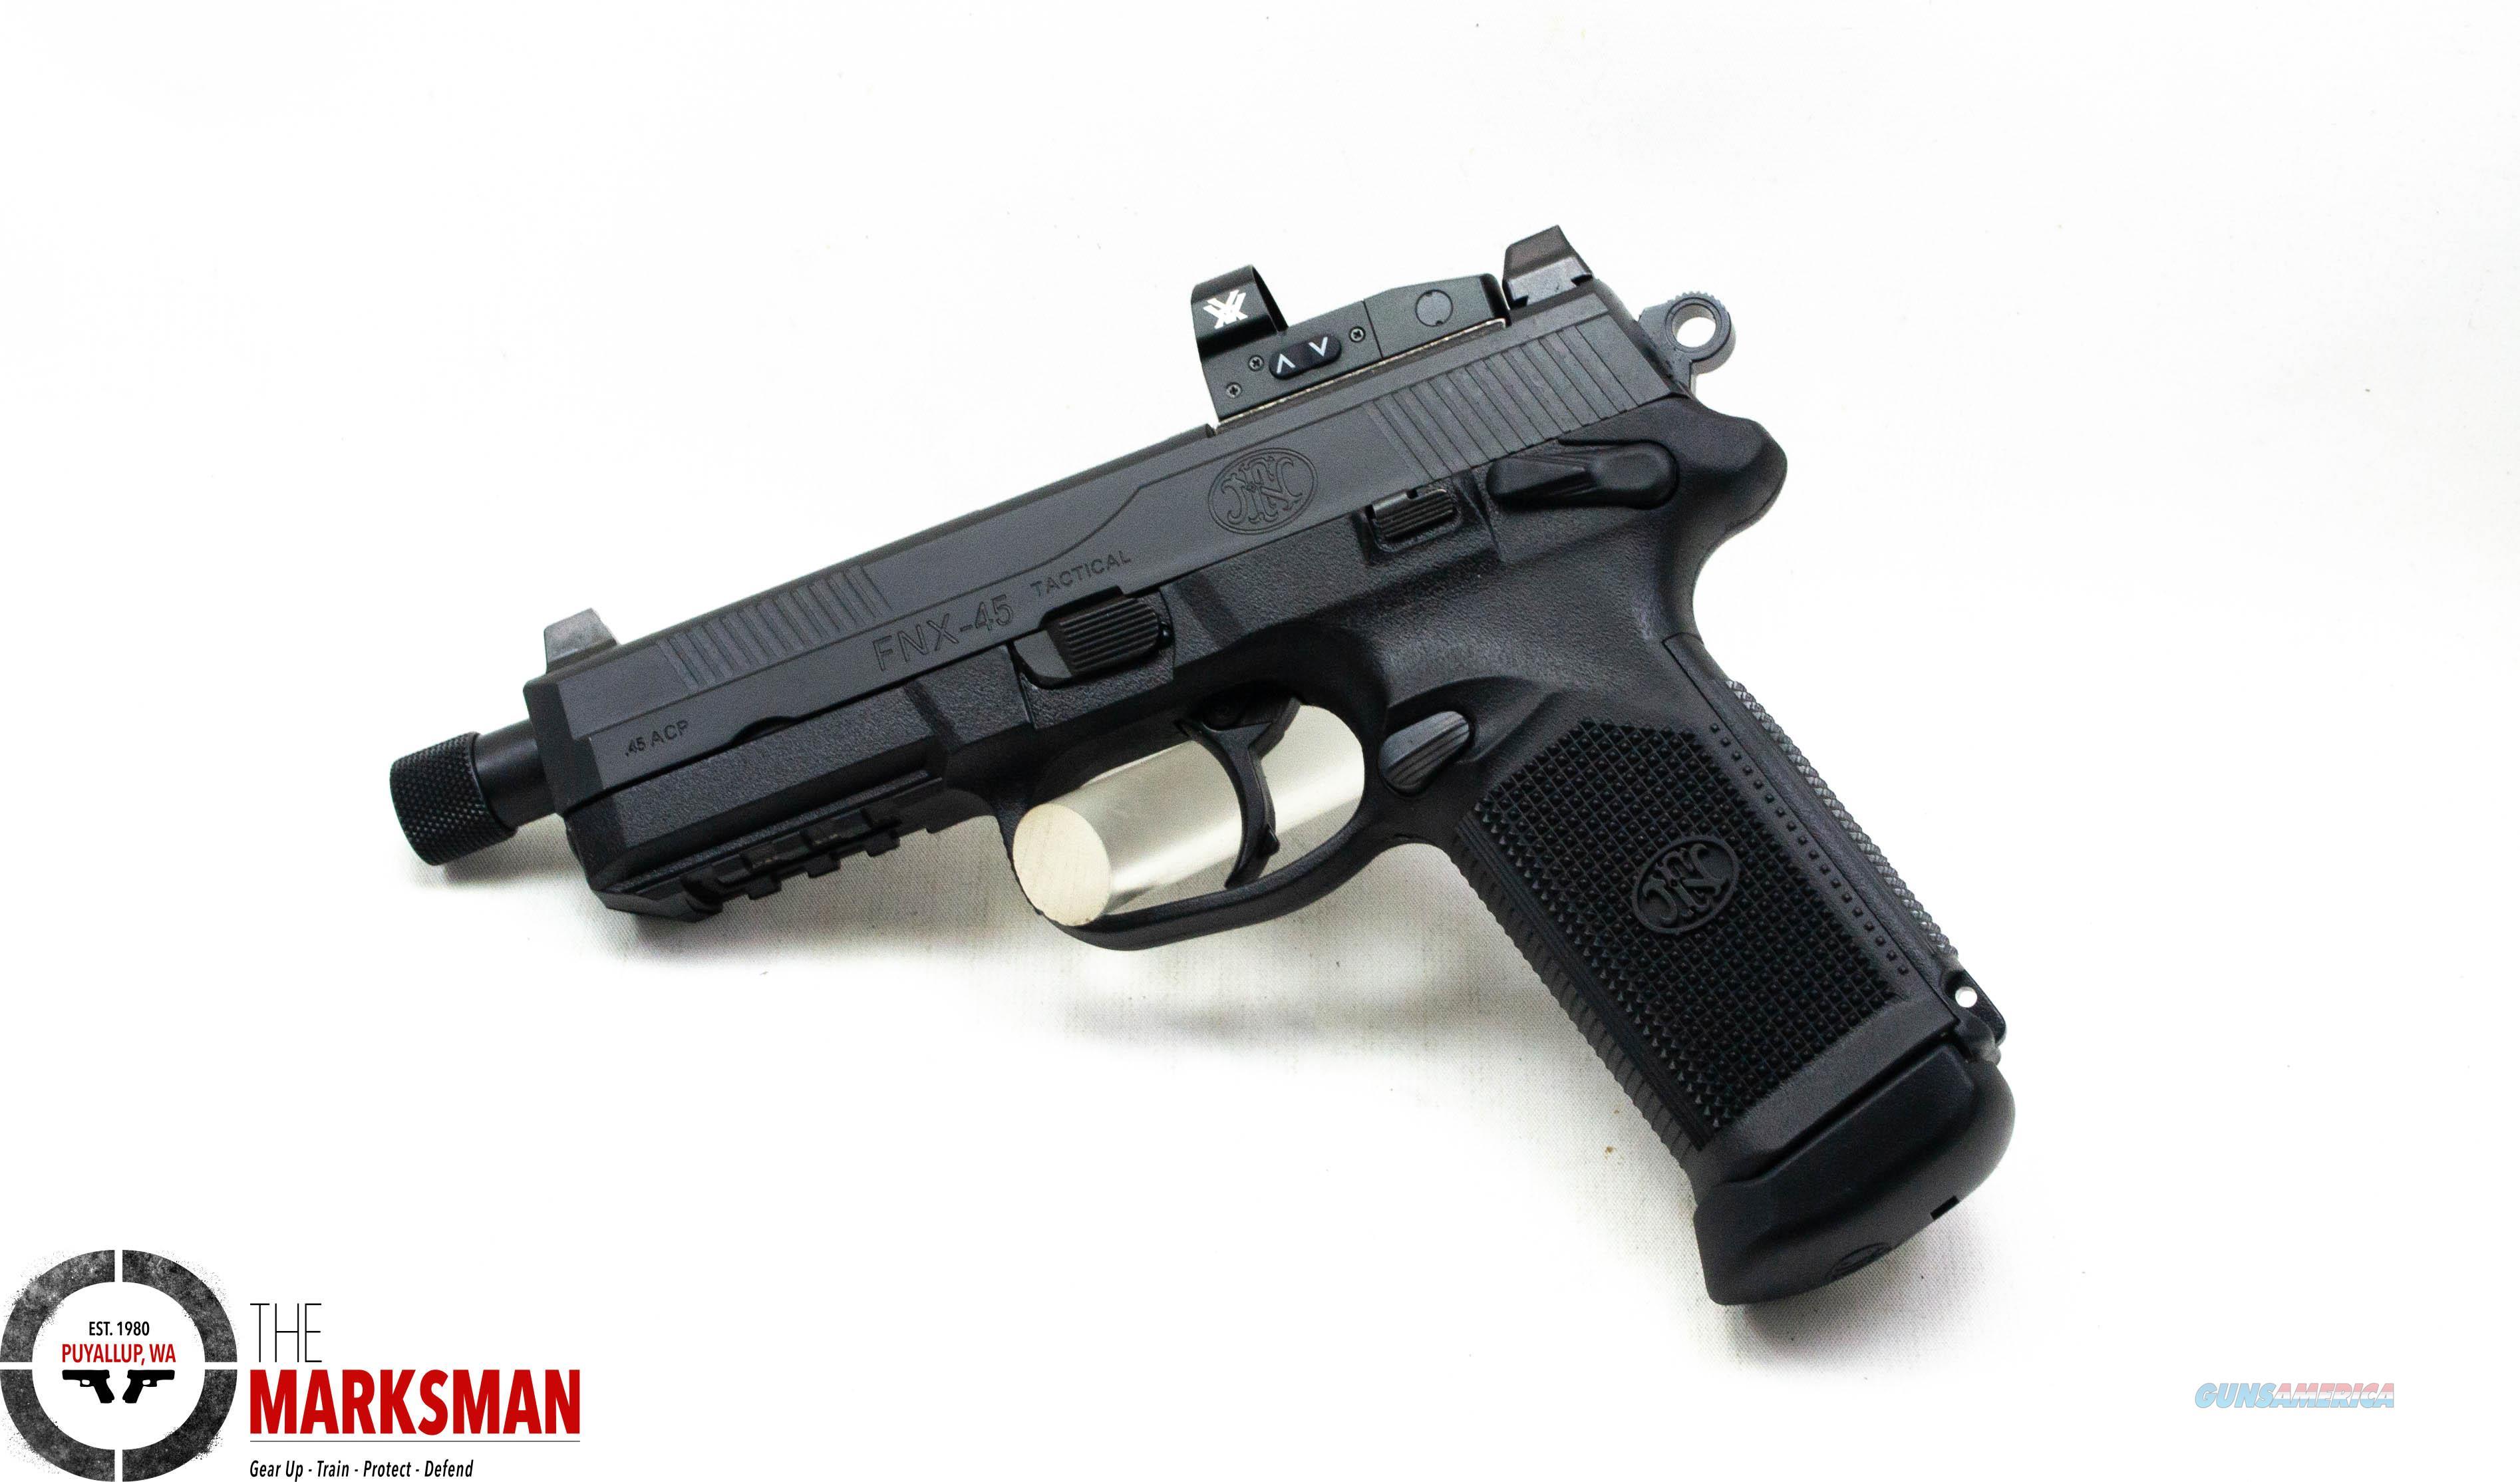 FN FNX-45 Tactical, .45 ACP, Vortex Venom Red Dot Optic NEW  Guns > Pistols > FNH - Fabrique Nationale (FN) Pistols > FNX